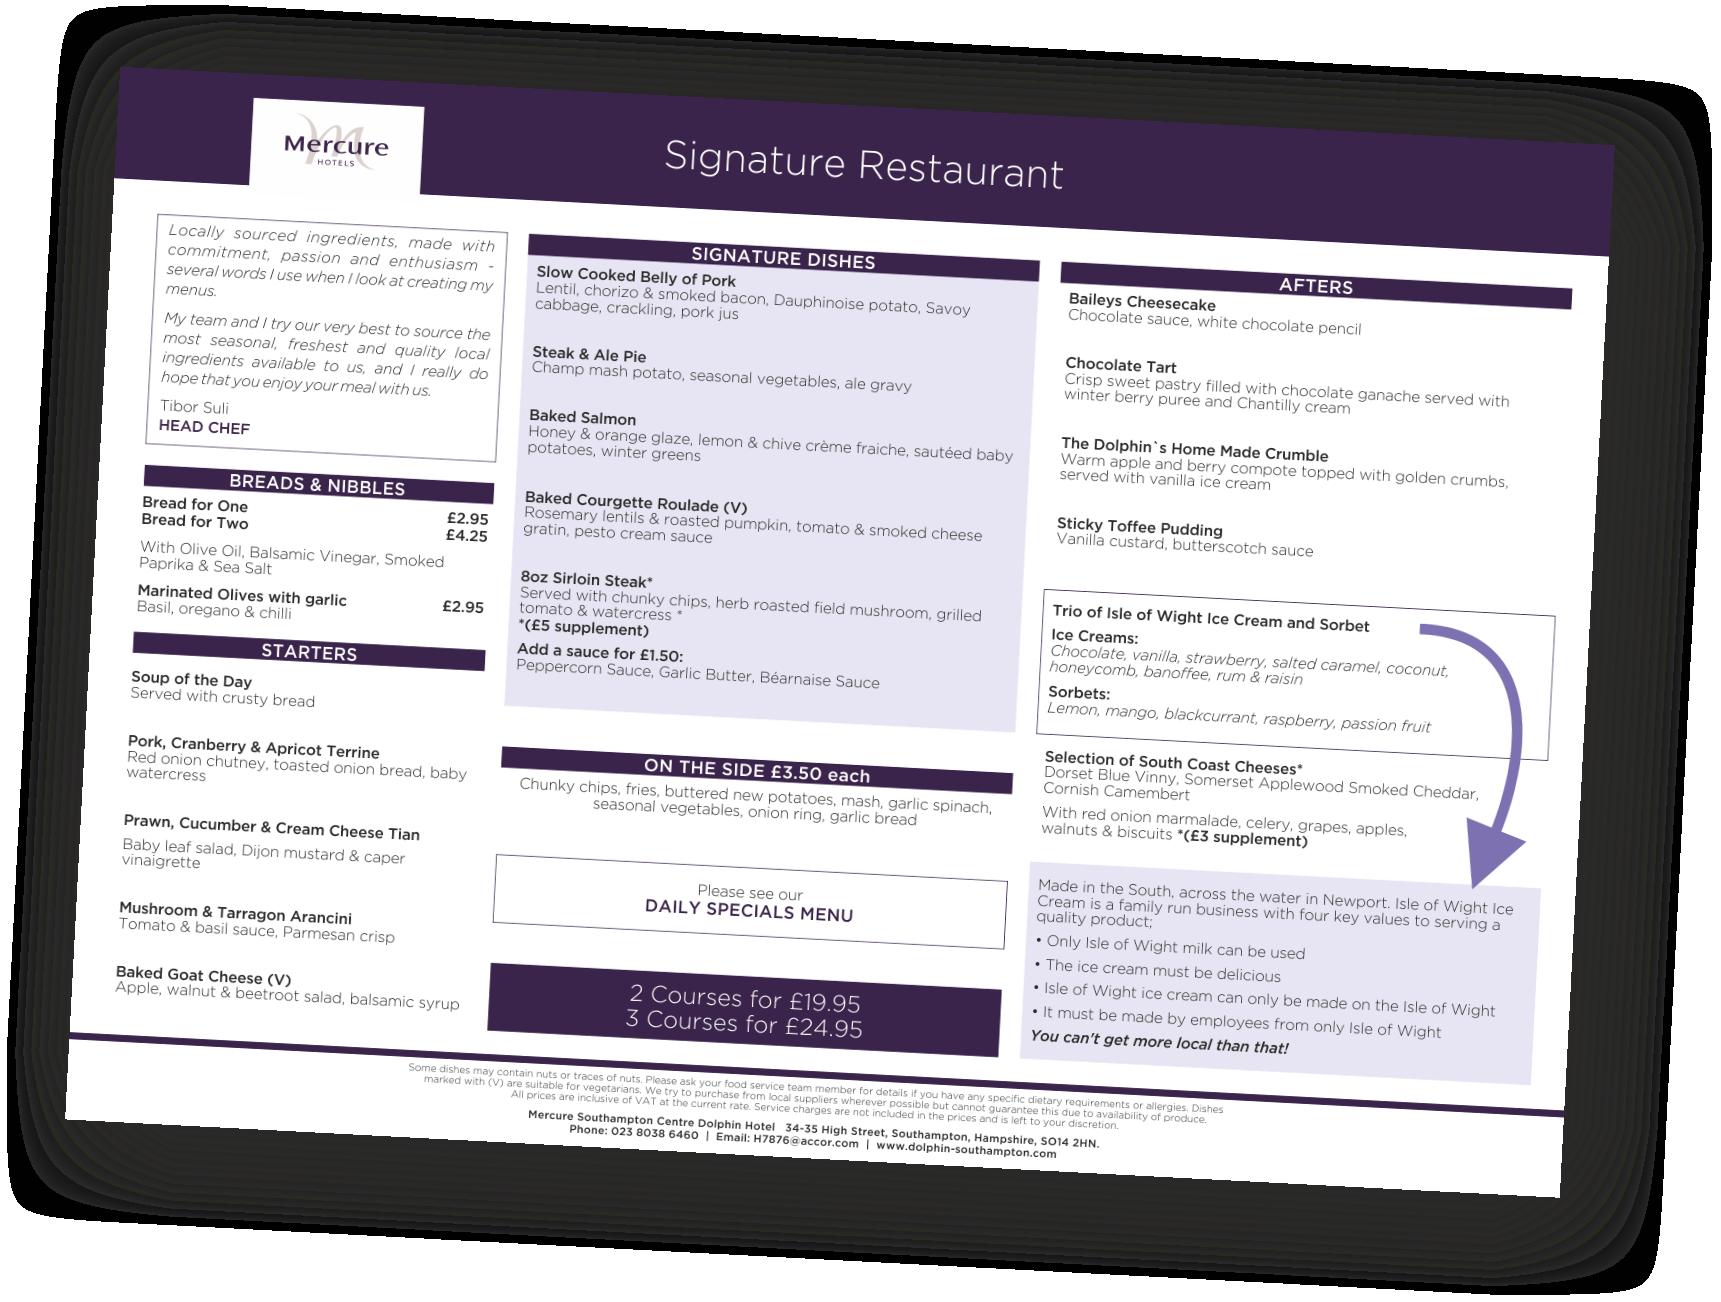 Mercure Southampton Centre Dolphin hotel A la Carte menu November 2018